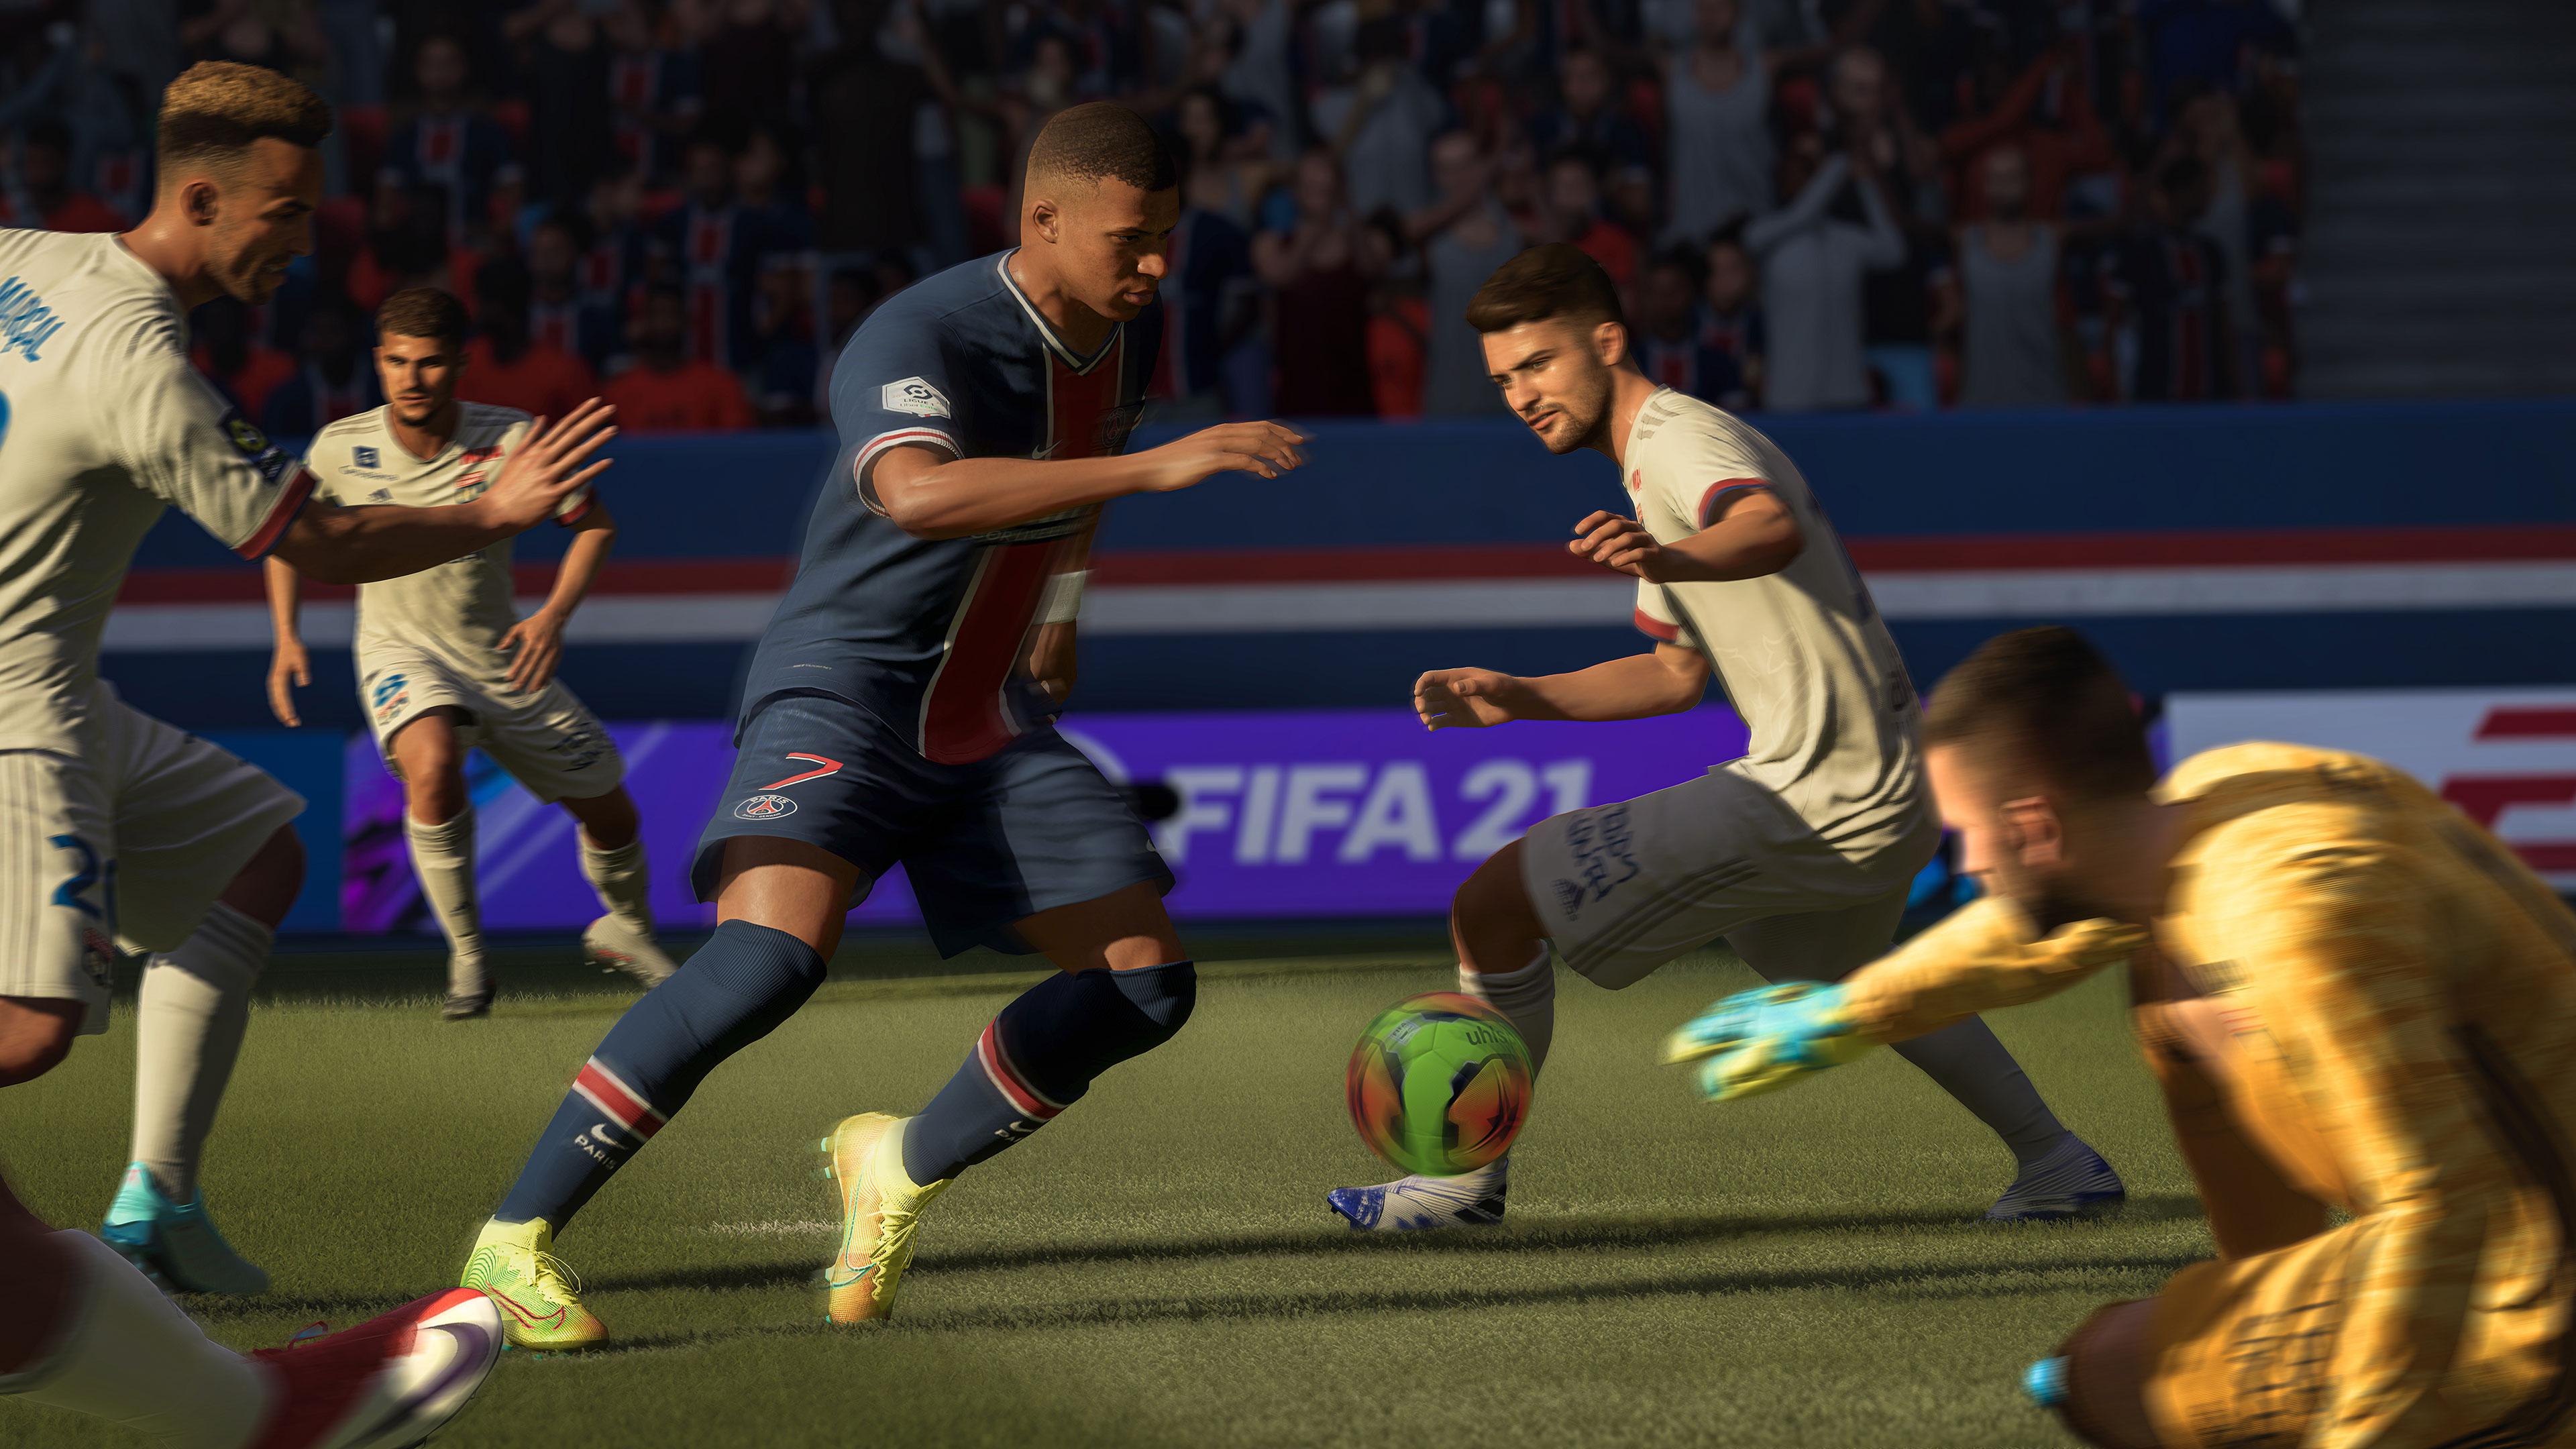 Скриншот №5 к FIFA 21 издание Champions PS4 and PS5